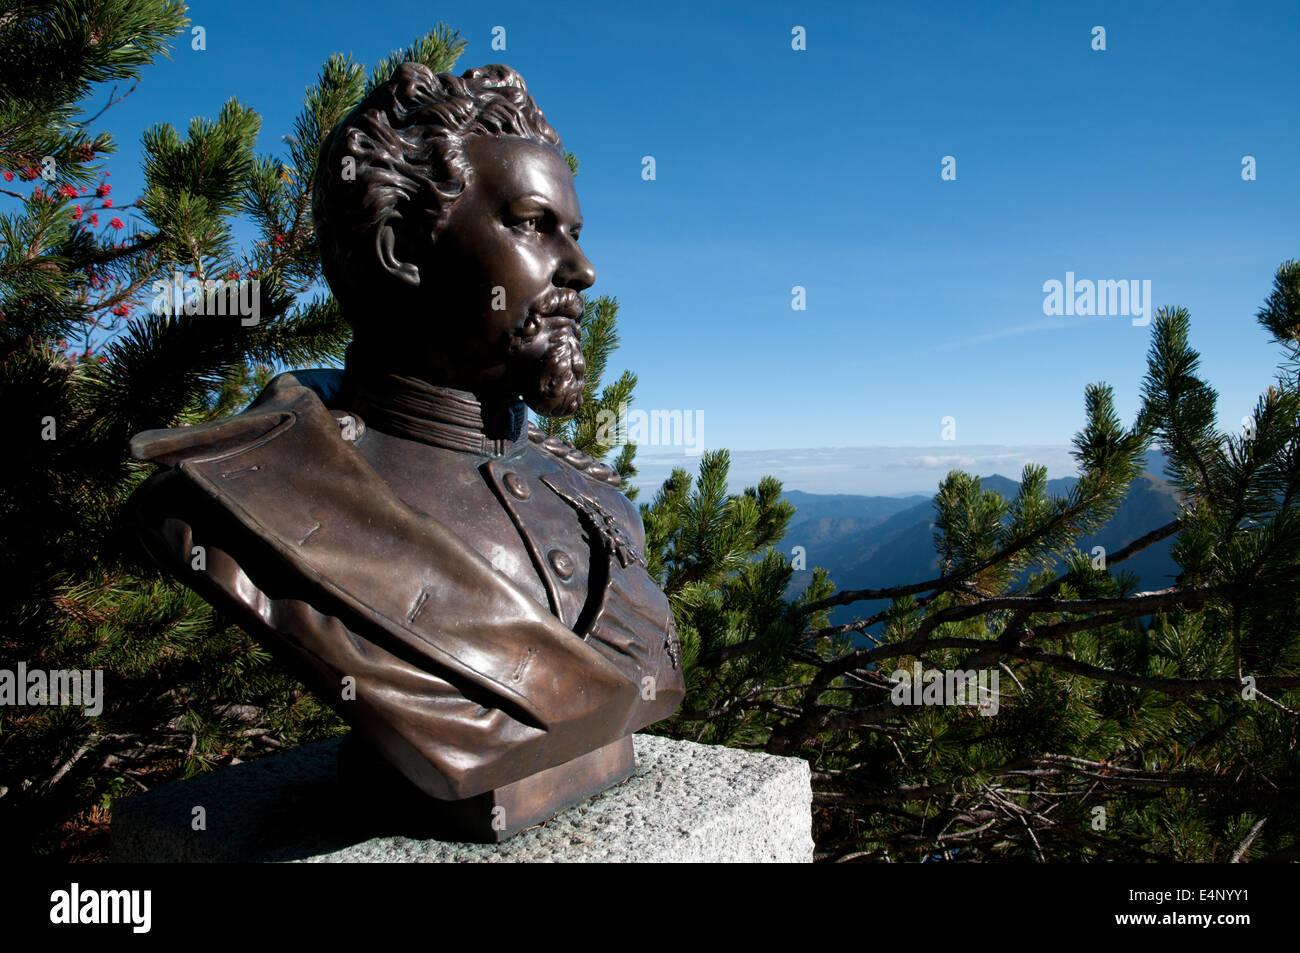 Bust of Bavarian King Ludwig II, builder of Neuschwanstein castle, overlooking the Alps on Mount Herzogstand, Bavarian - Stock Image